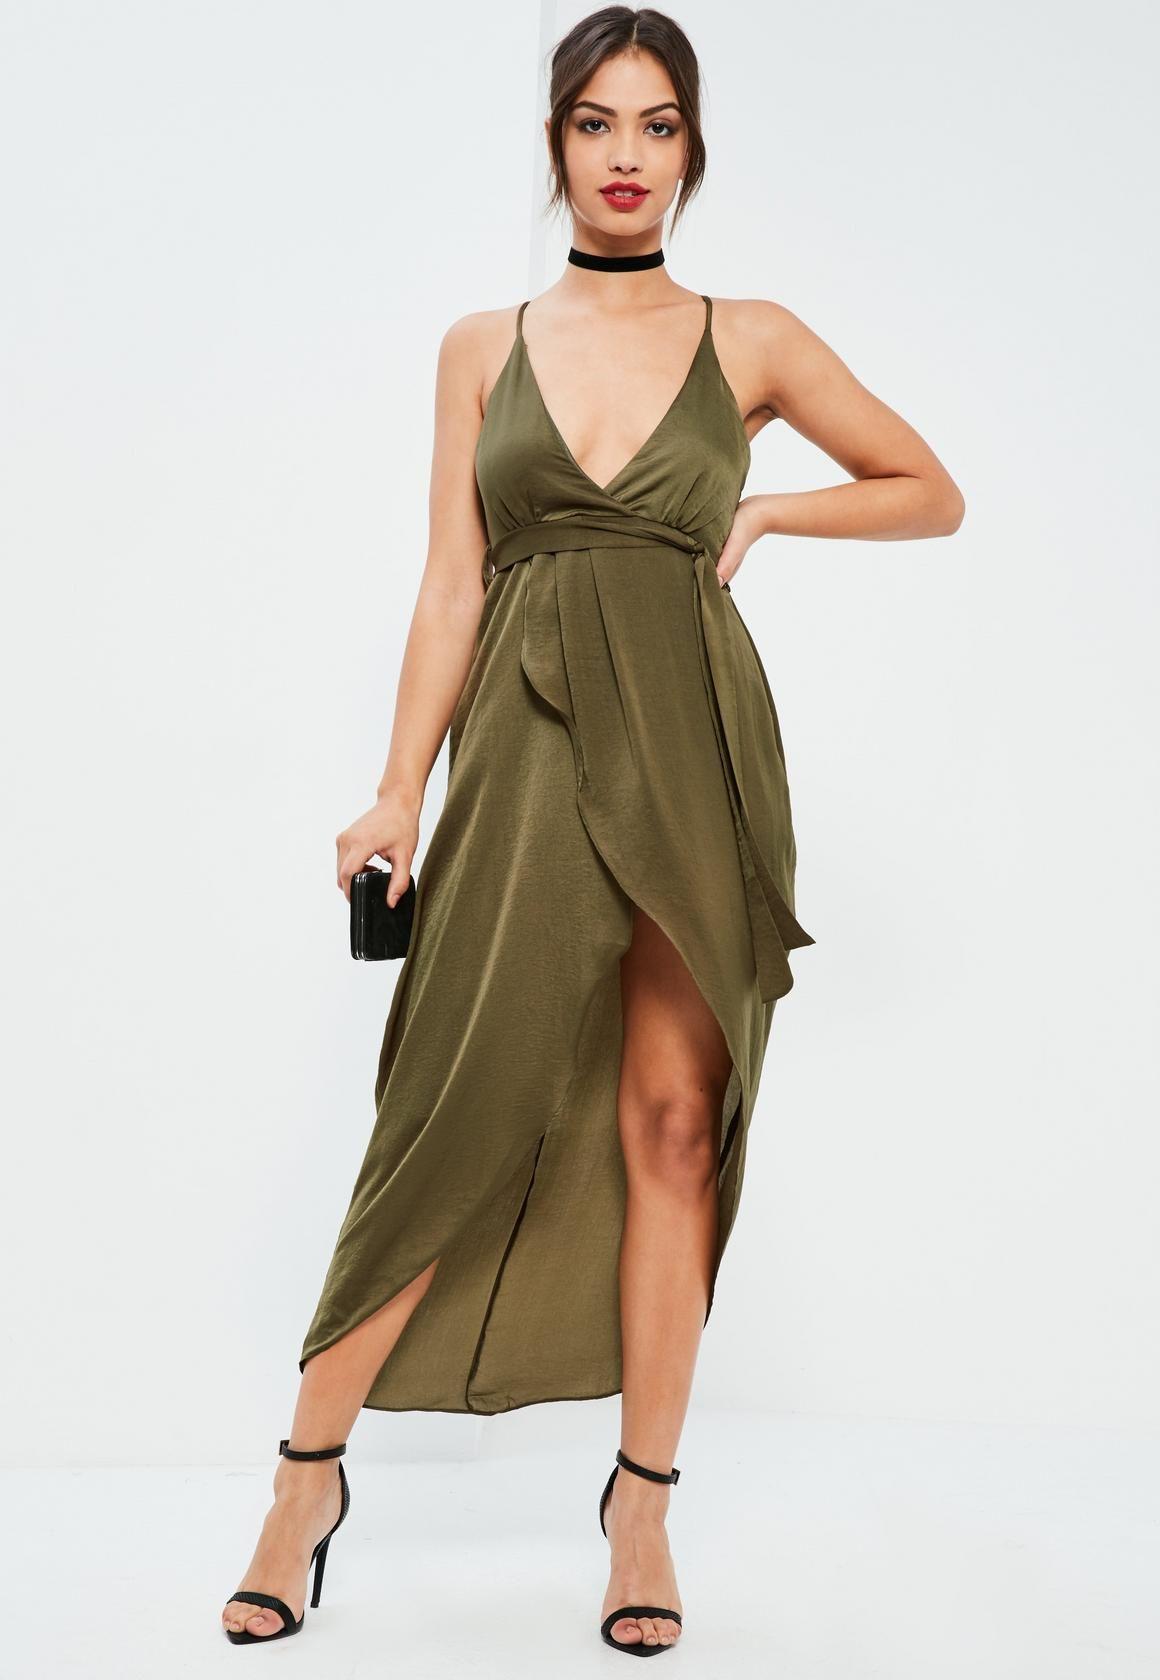 Missguided - Khaki Silky Plunge Asymmetric Wrap Midi Dress